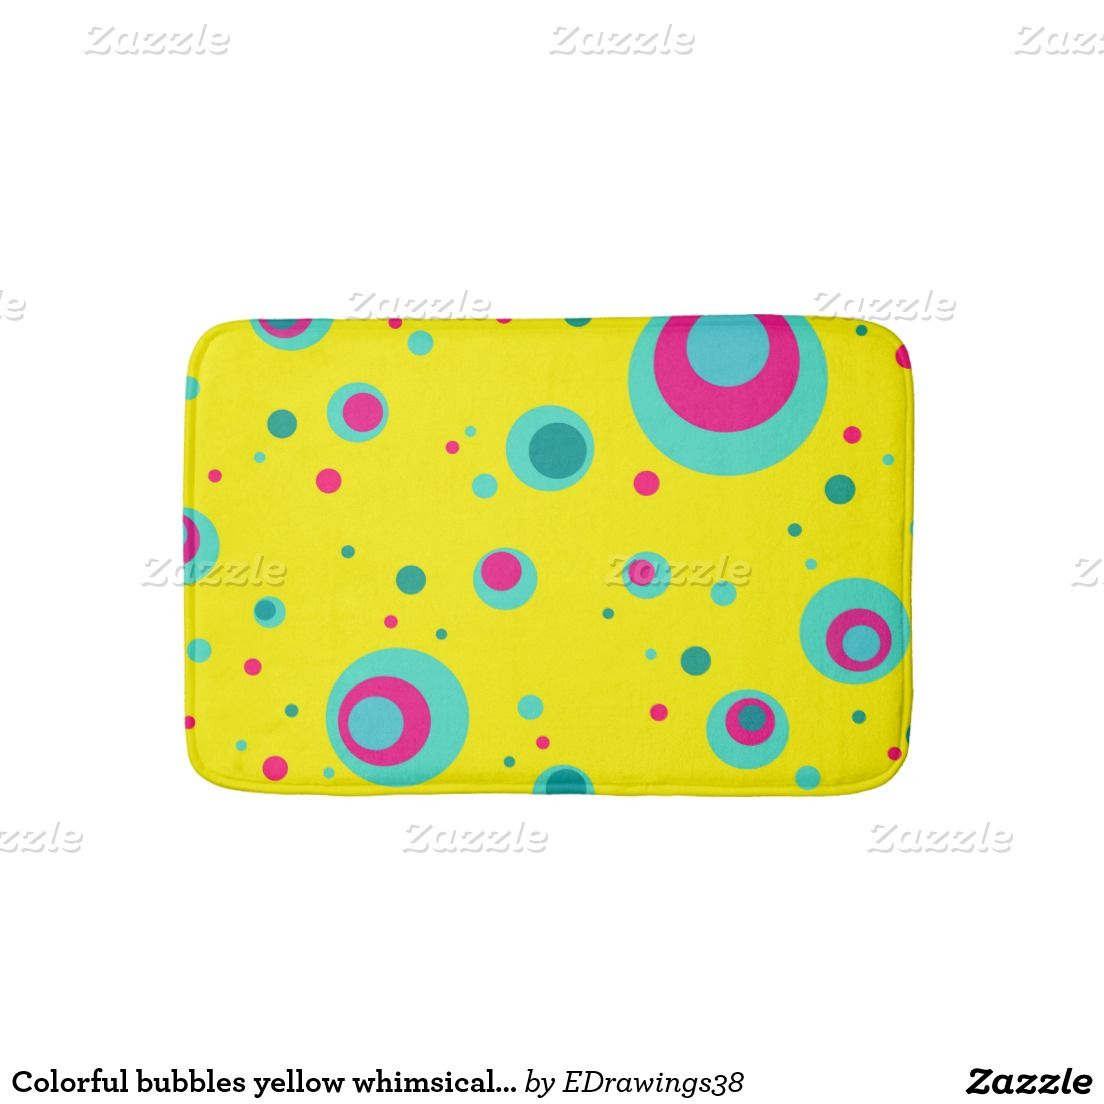 #Colorful #bubbles #yellow whimsical design #bathmats